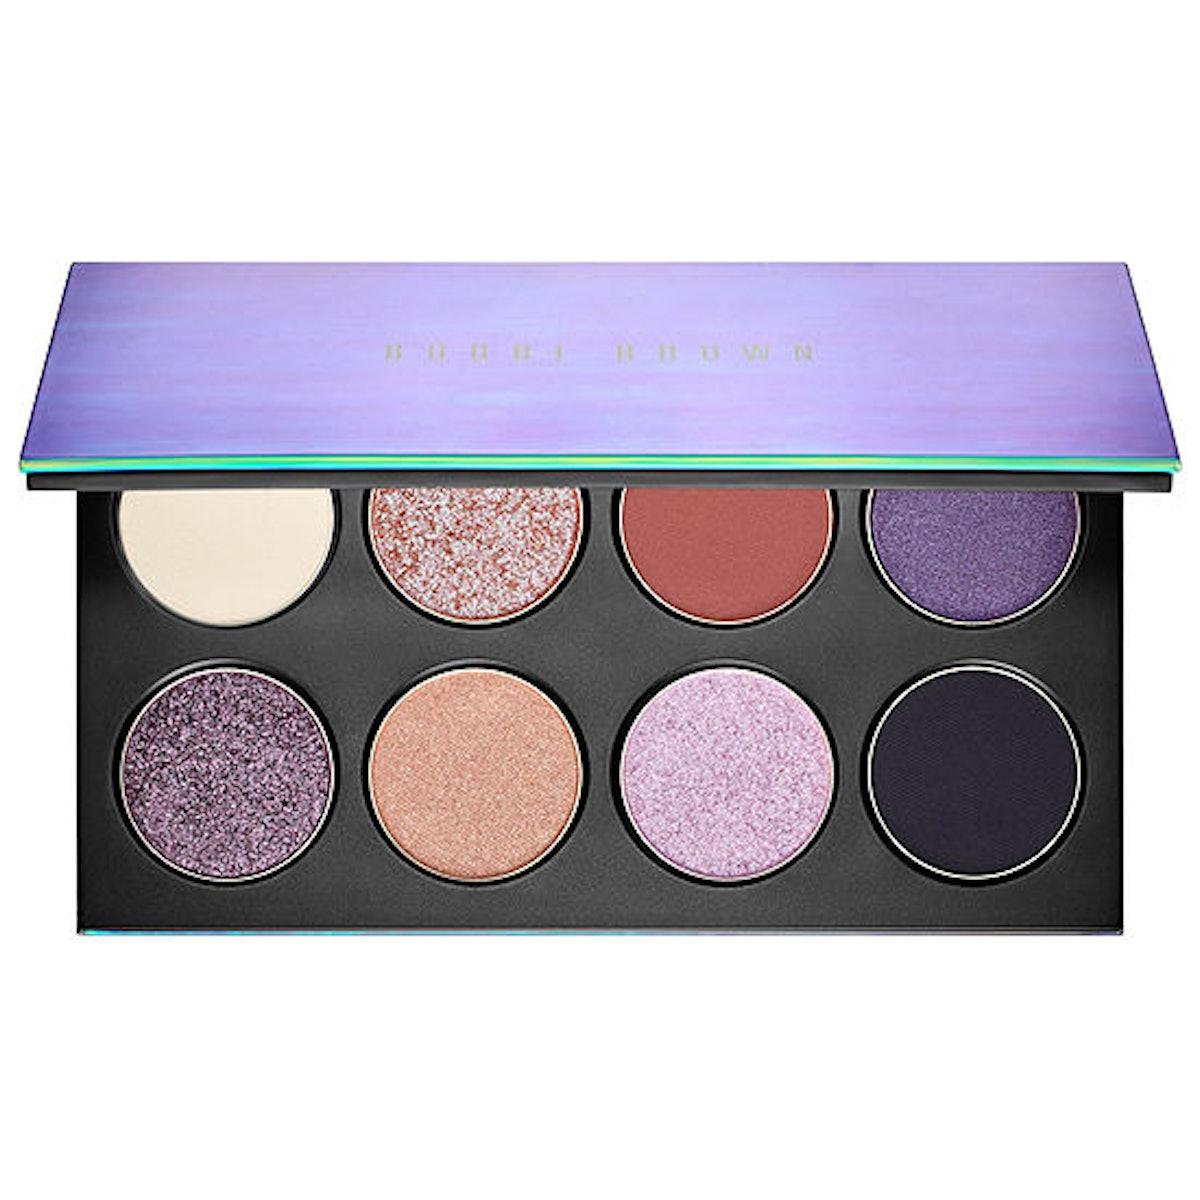 BOBBI BROWN Ultra-Violet Eyeshadow Palette